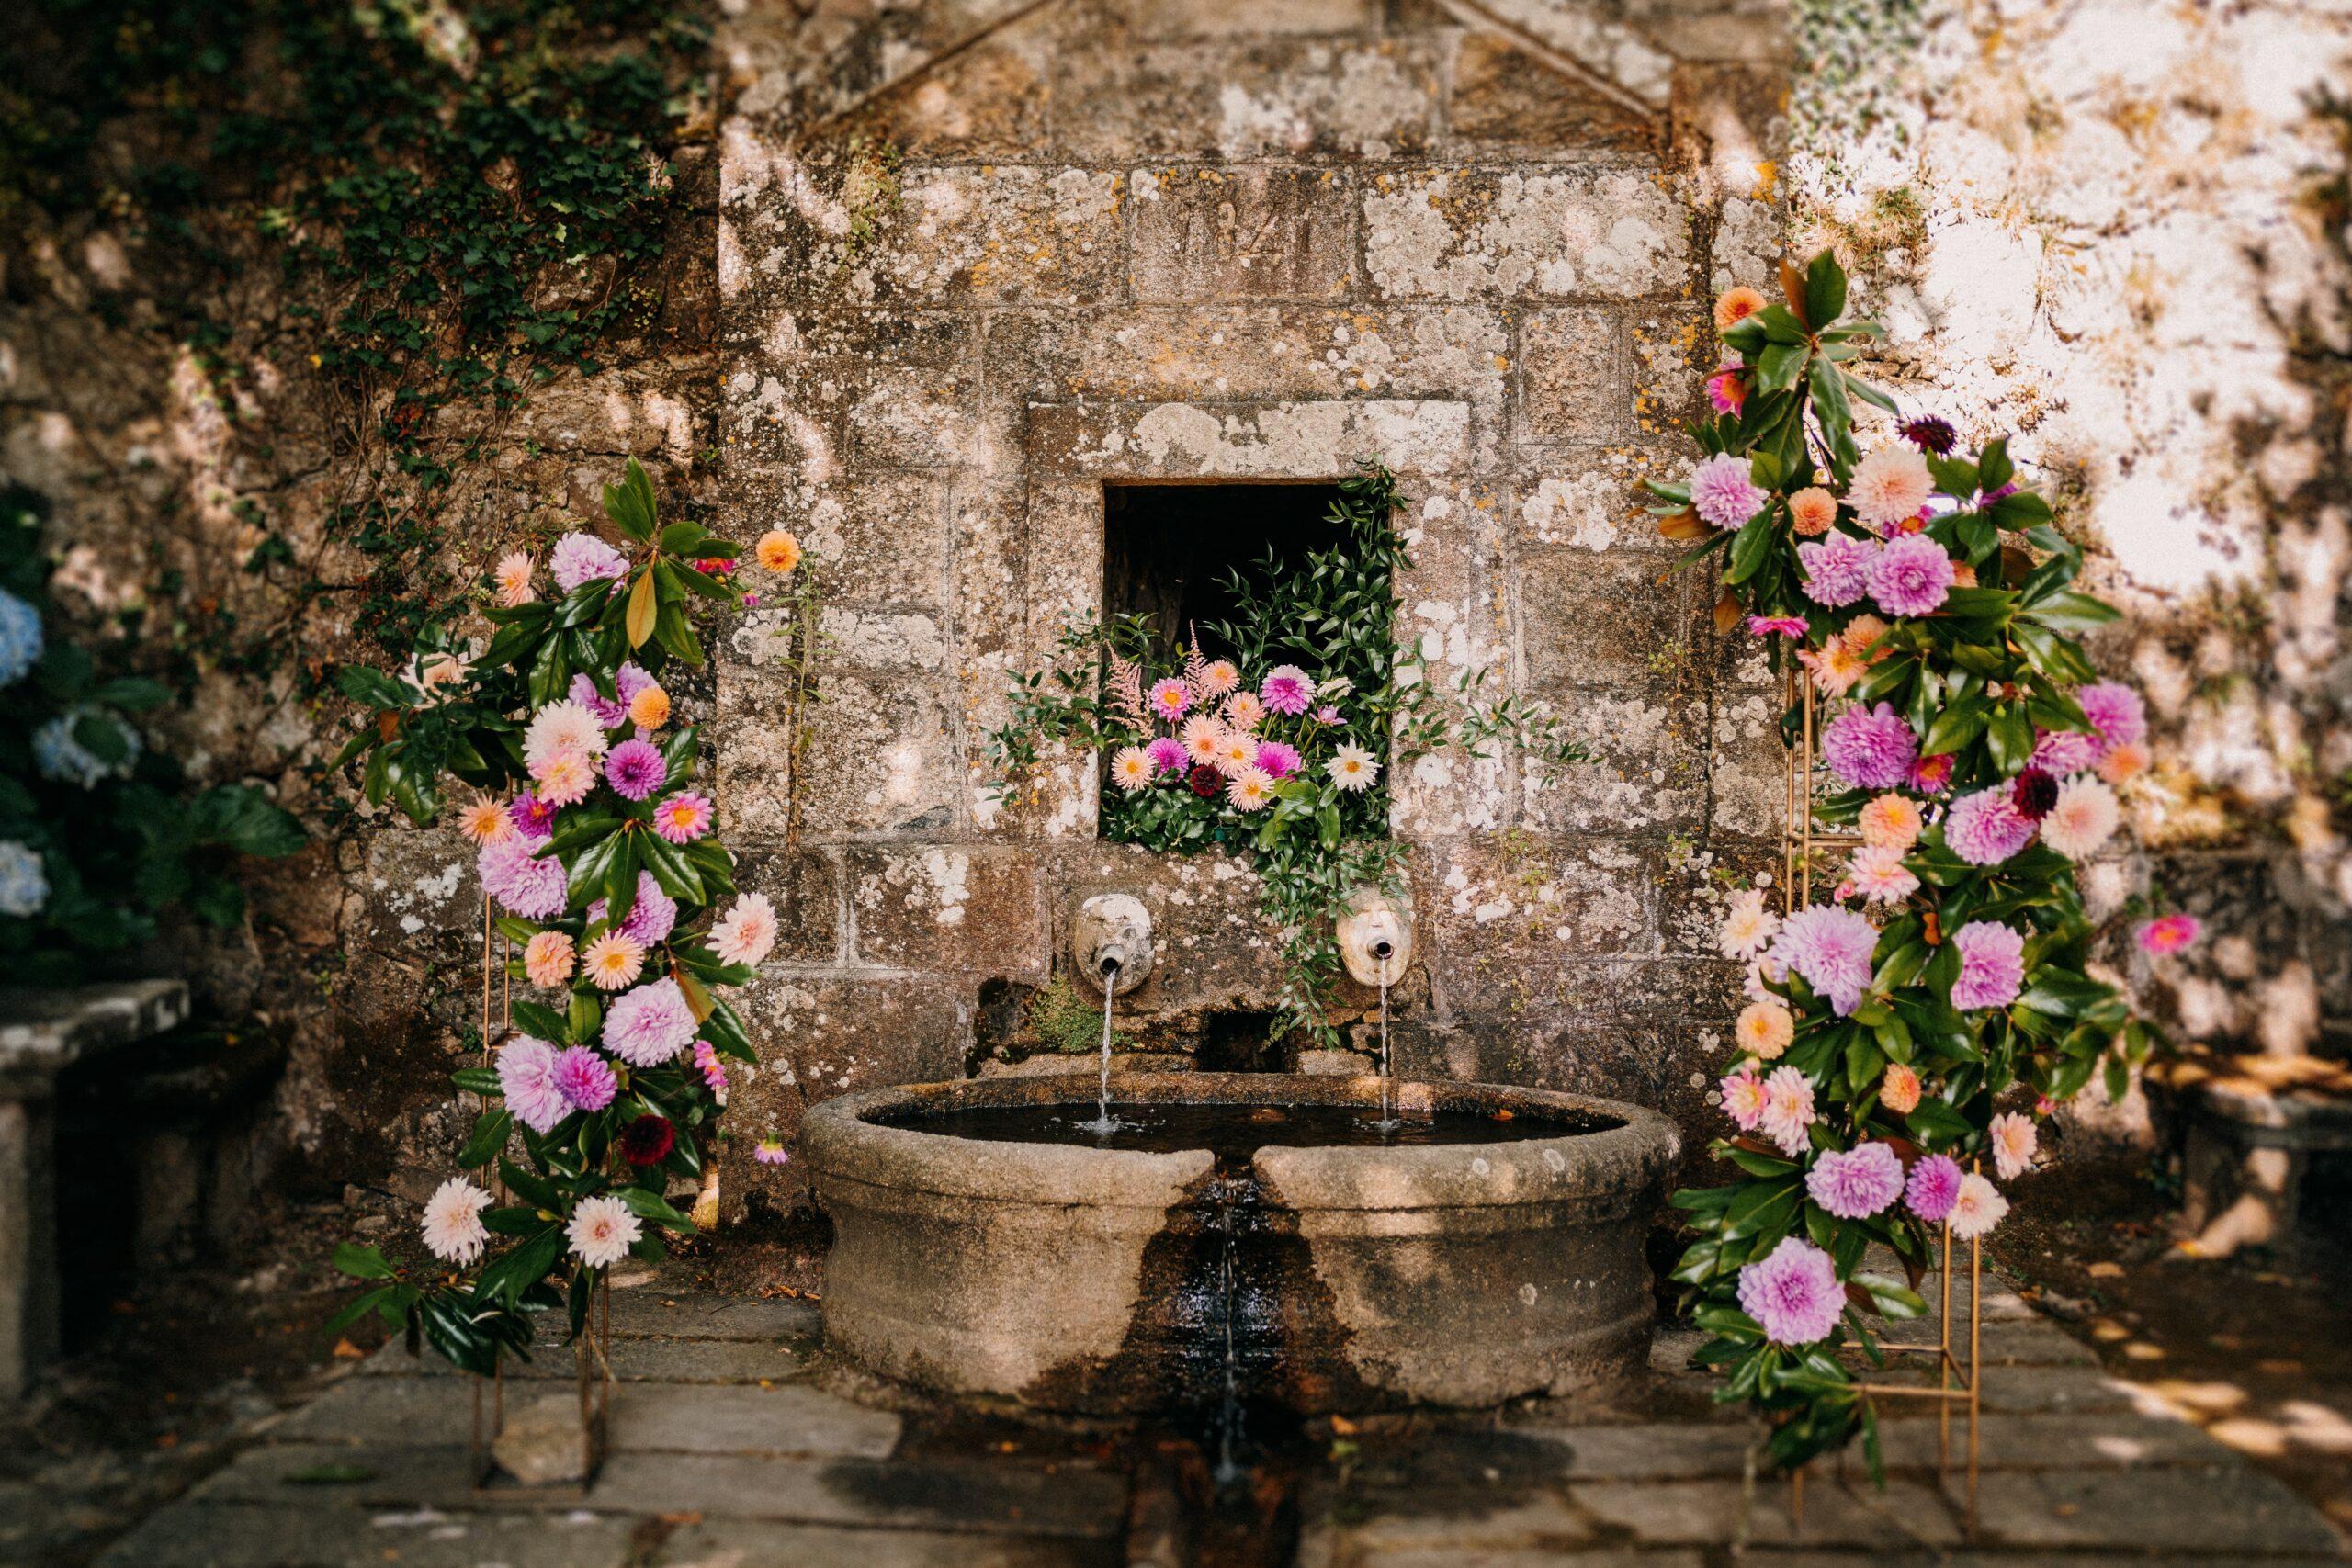 Decoración floral para boda en un pazo gallego